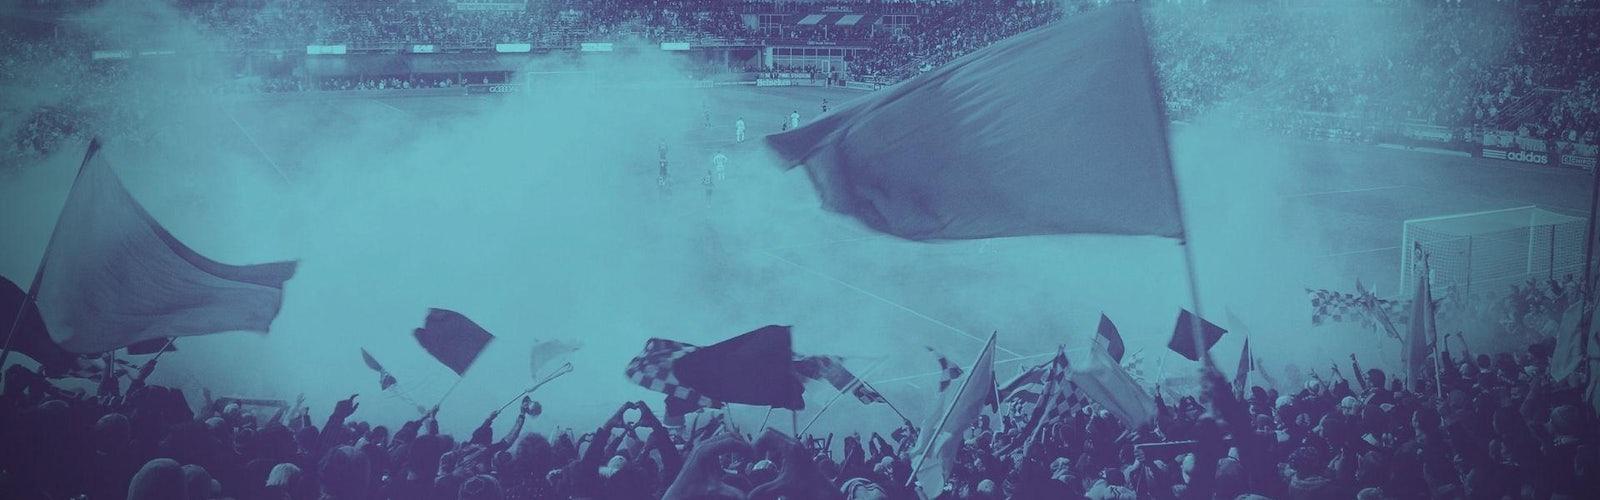 Sportwetten Anbieter Vergleich Banner